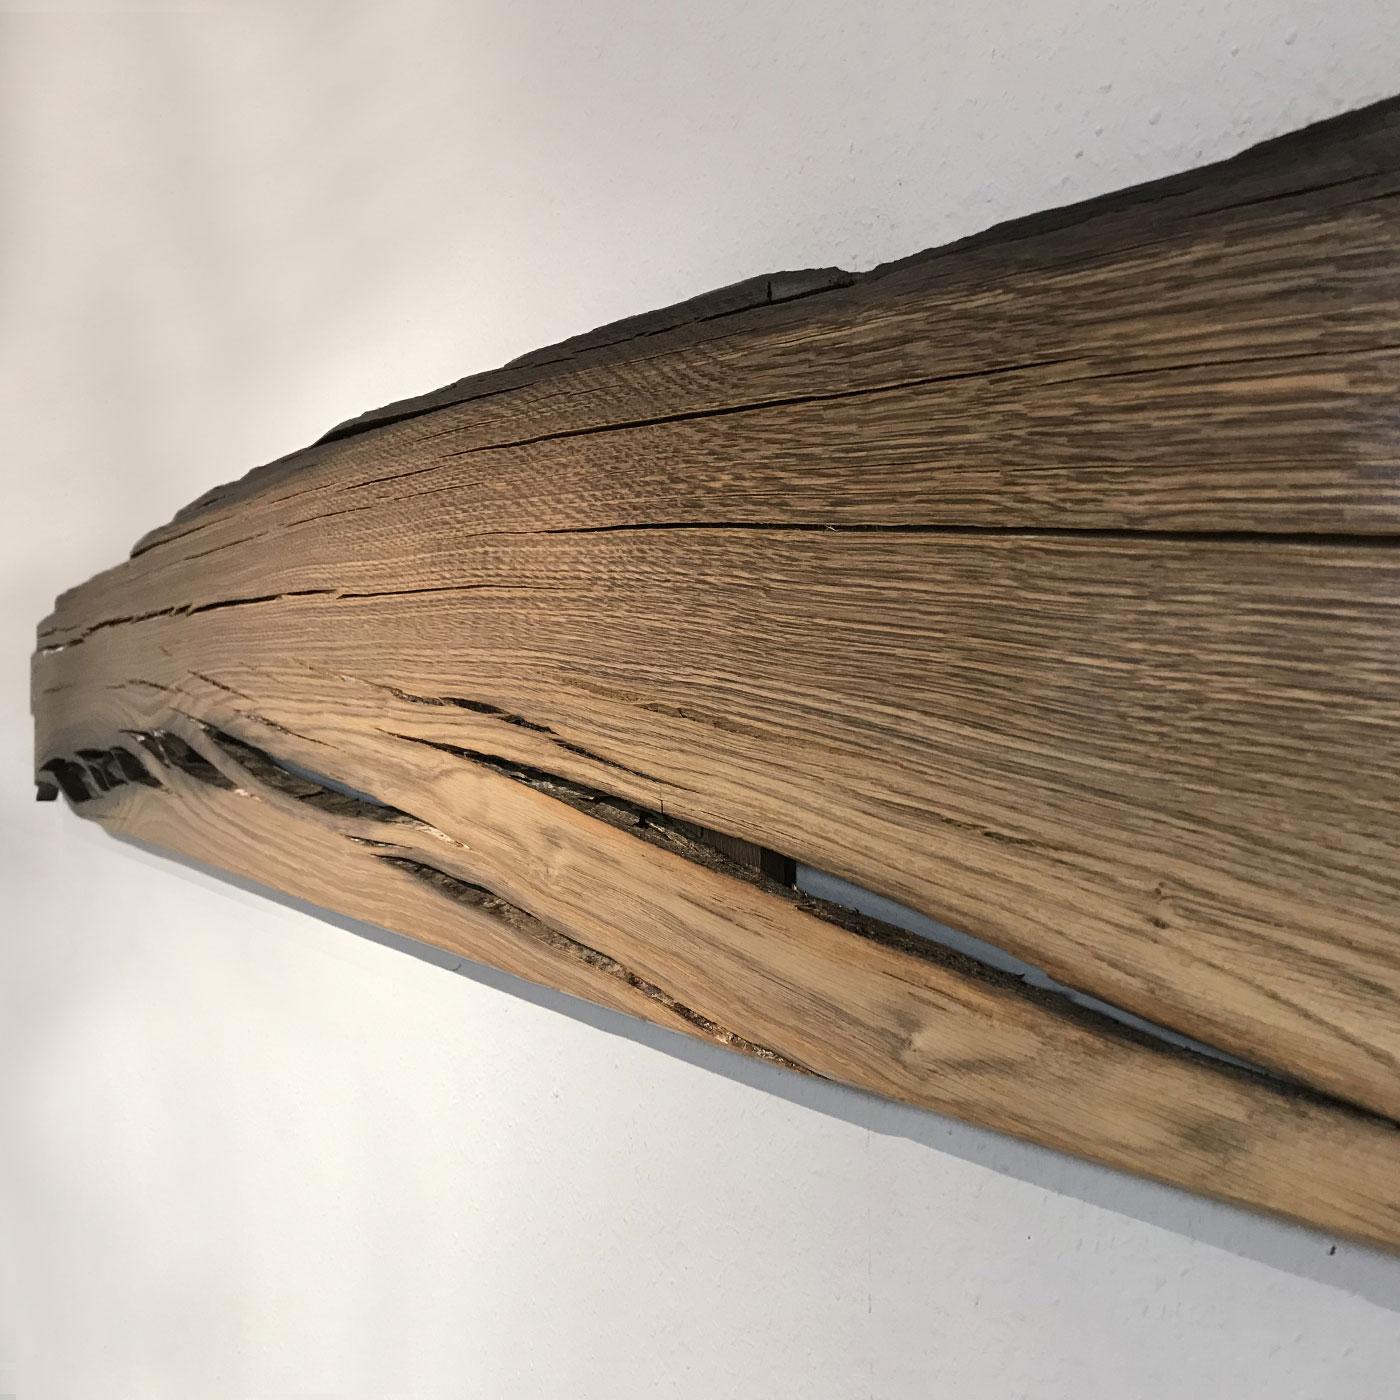 Gesprungene Bohle aus Moorholz als Wandobjekt